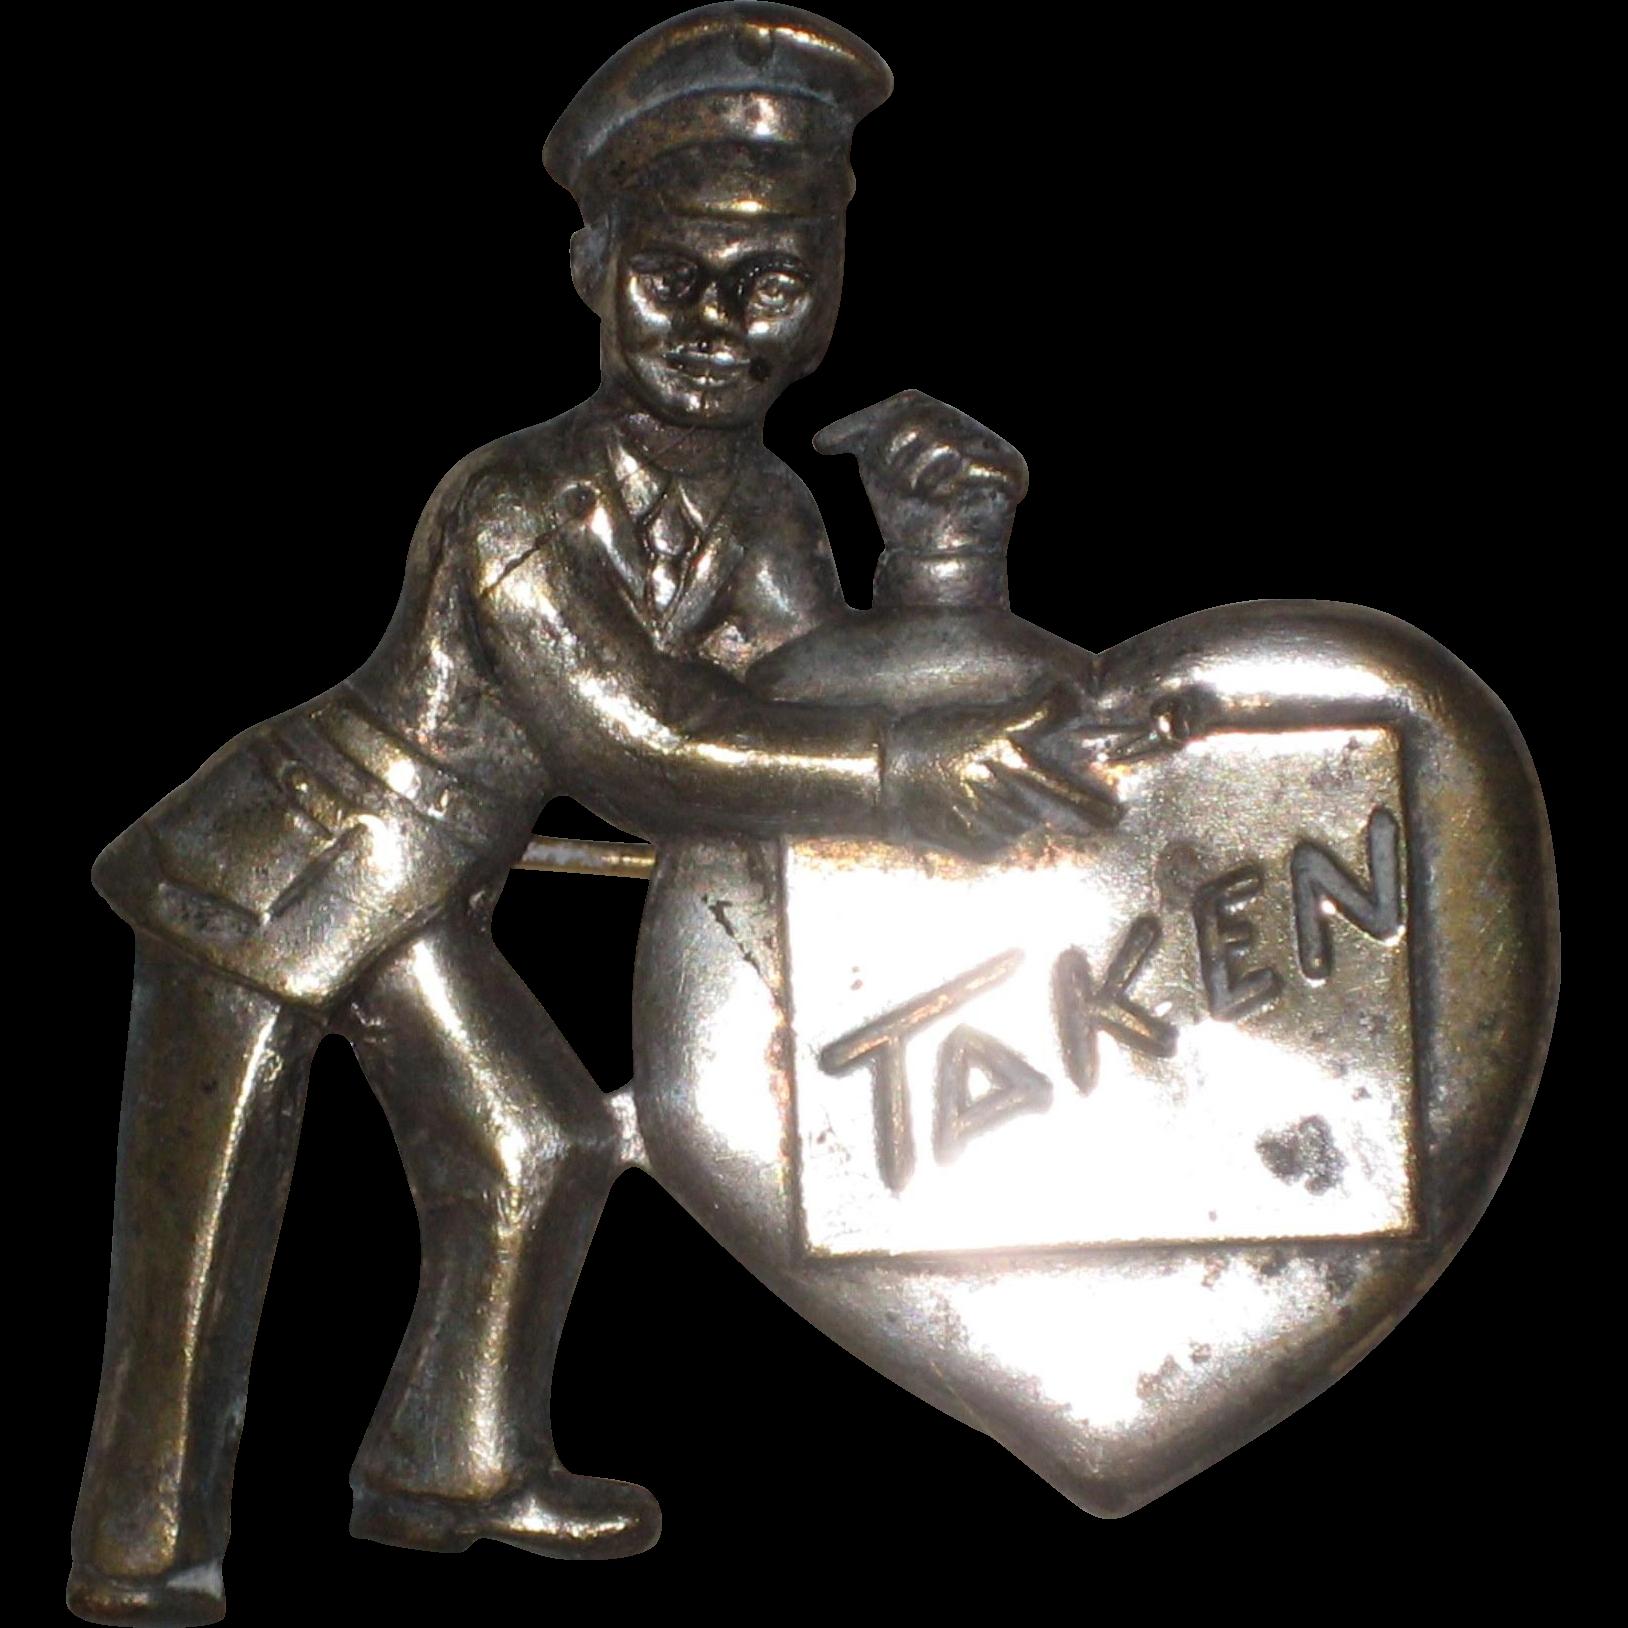 WWII Sweetheart Pin - Taken! - 1940's Military Memorabilia - Army Air Corps